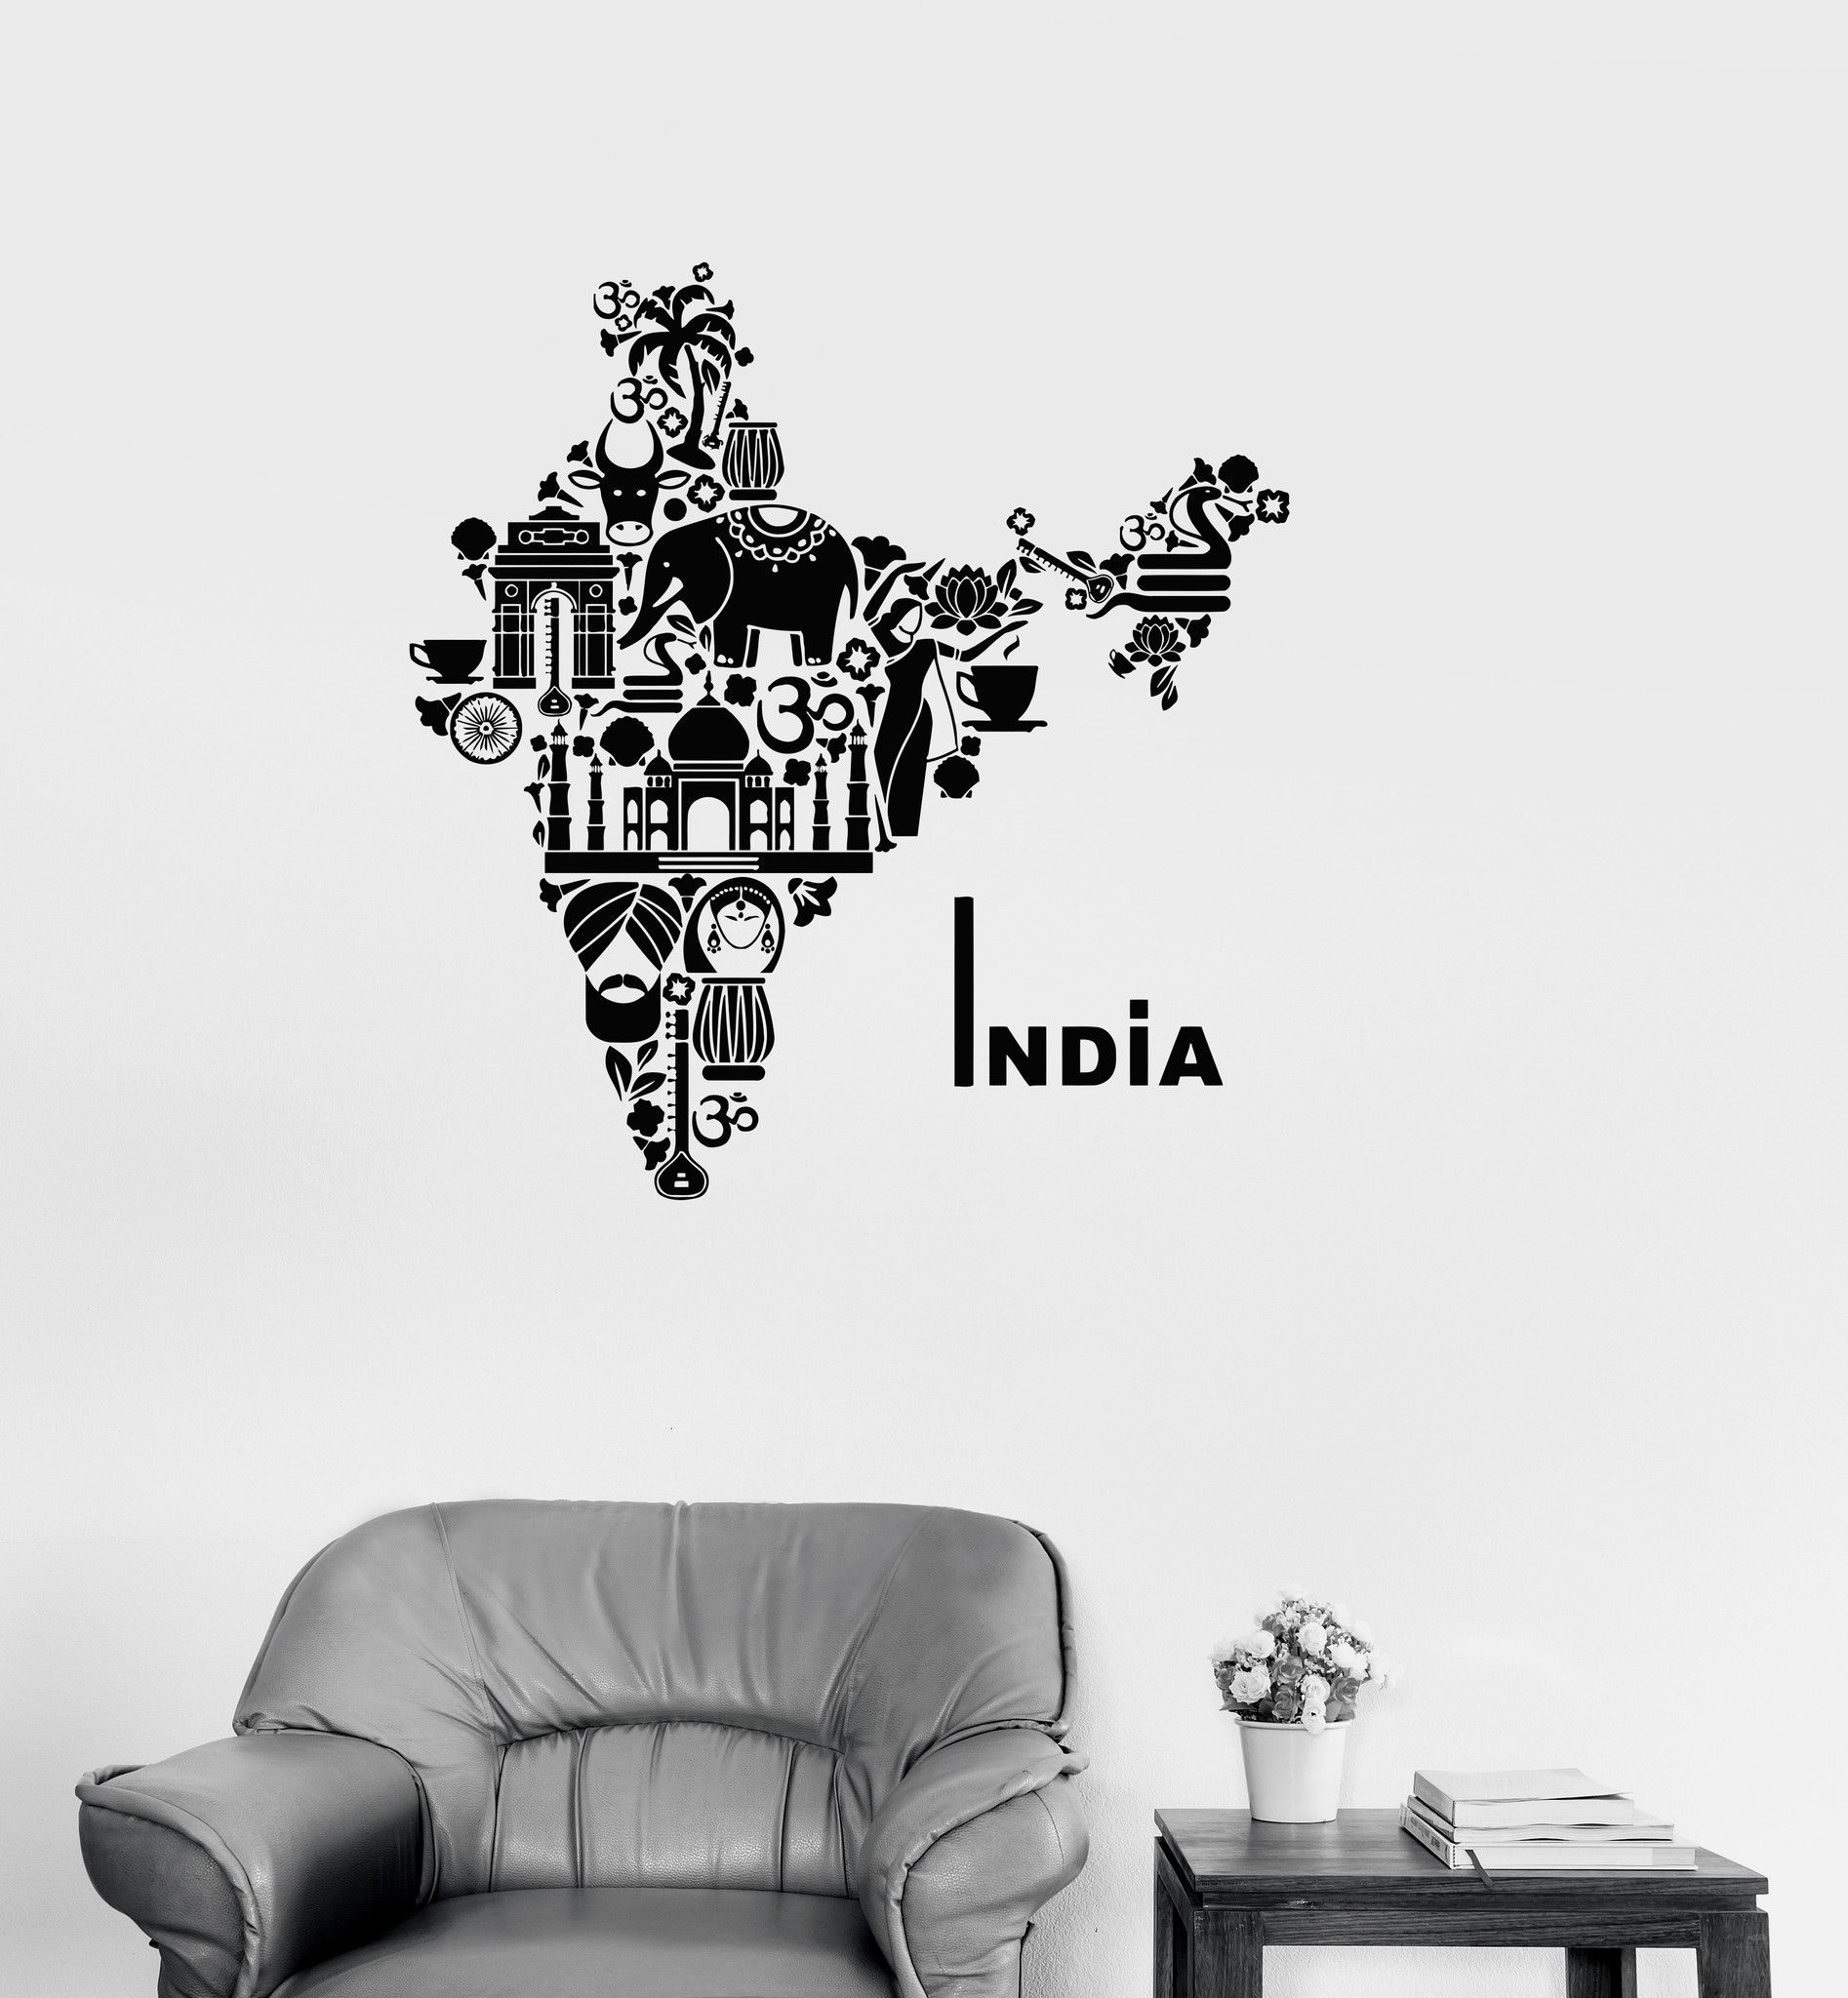 Vinyl Decal India Map Hindu Hinduism Elephant Symbols